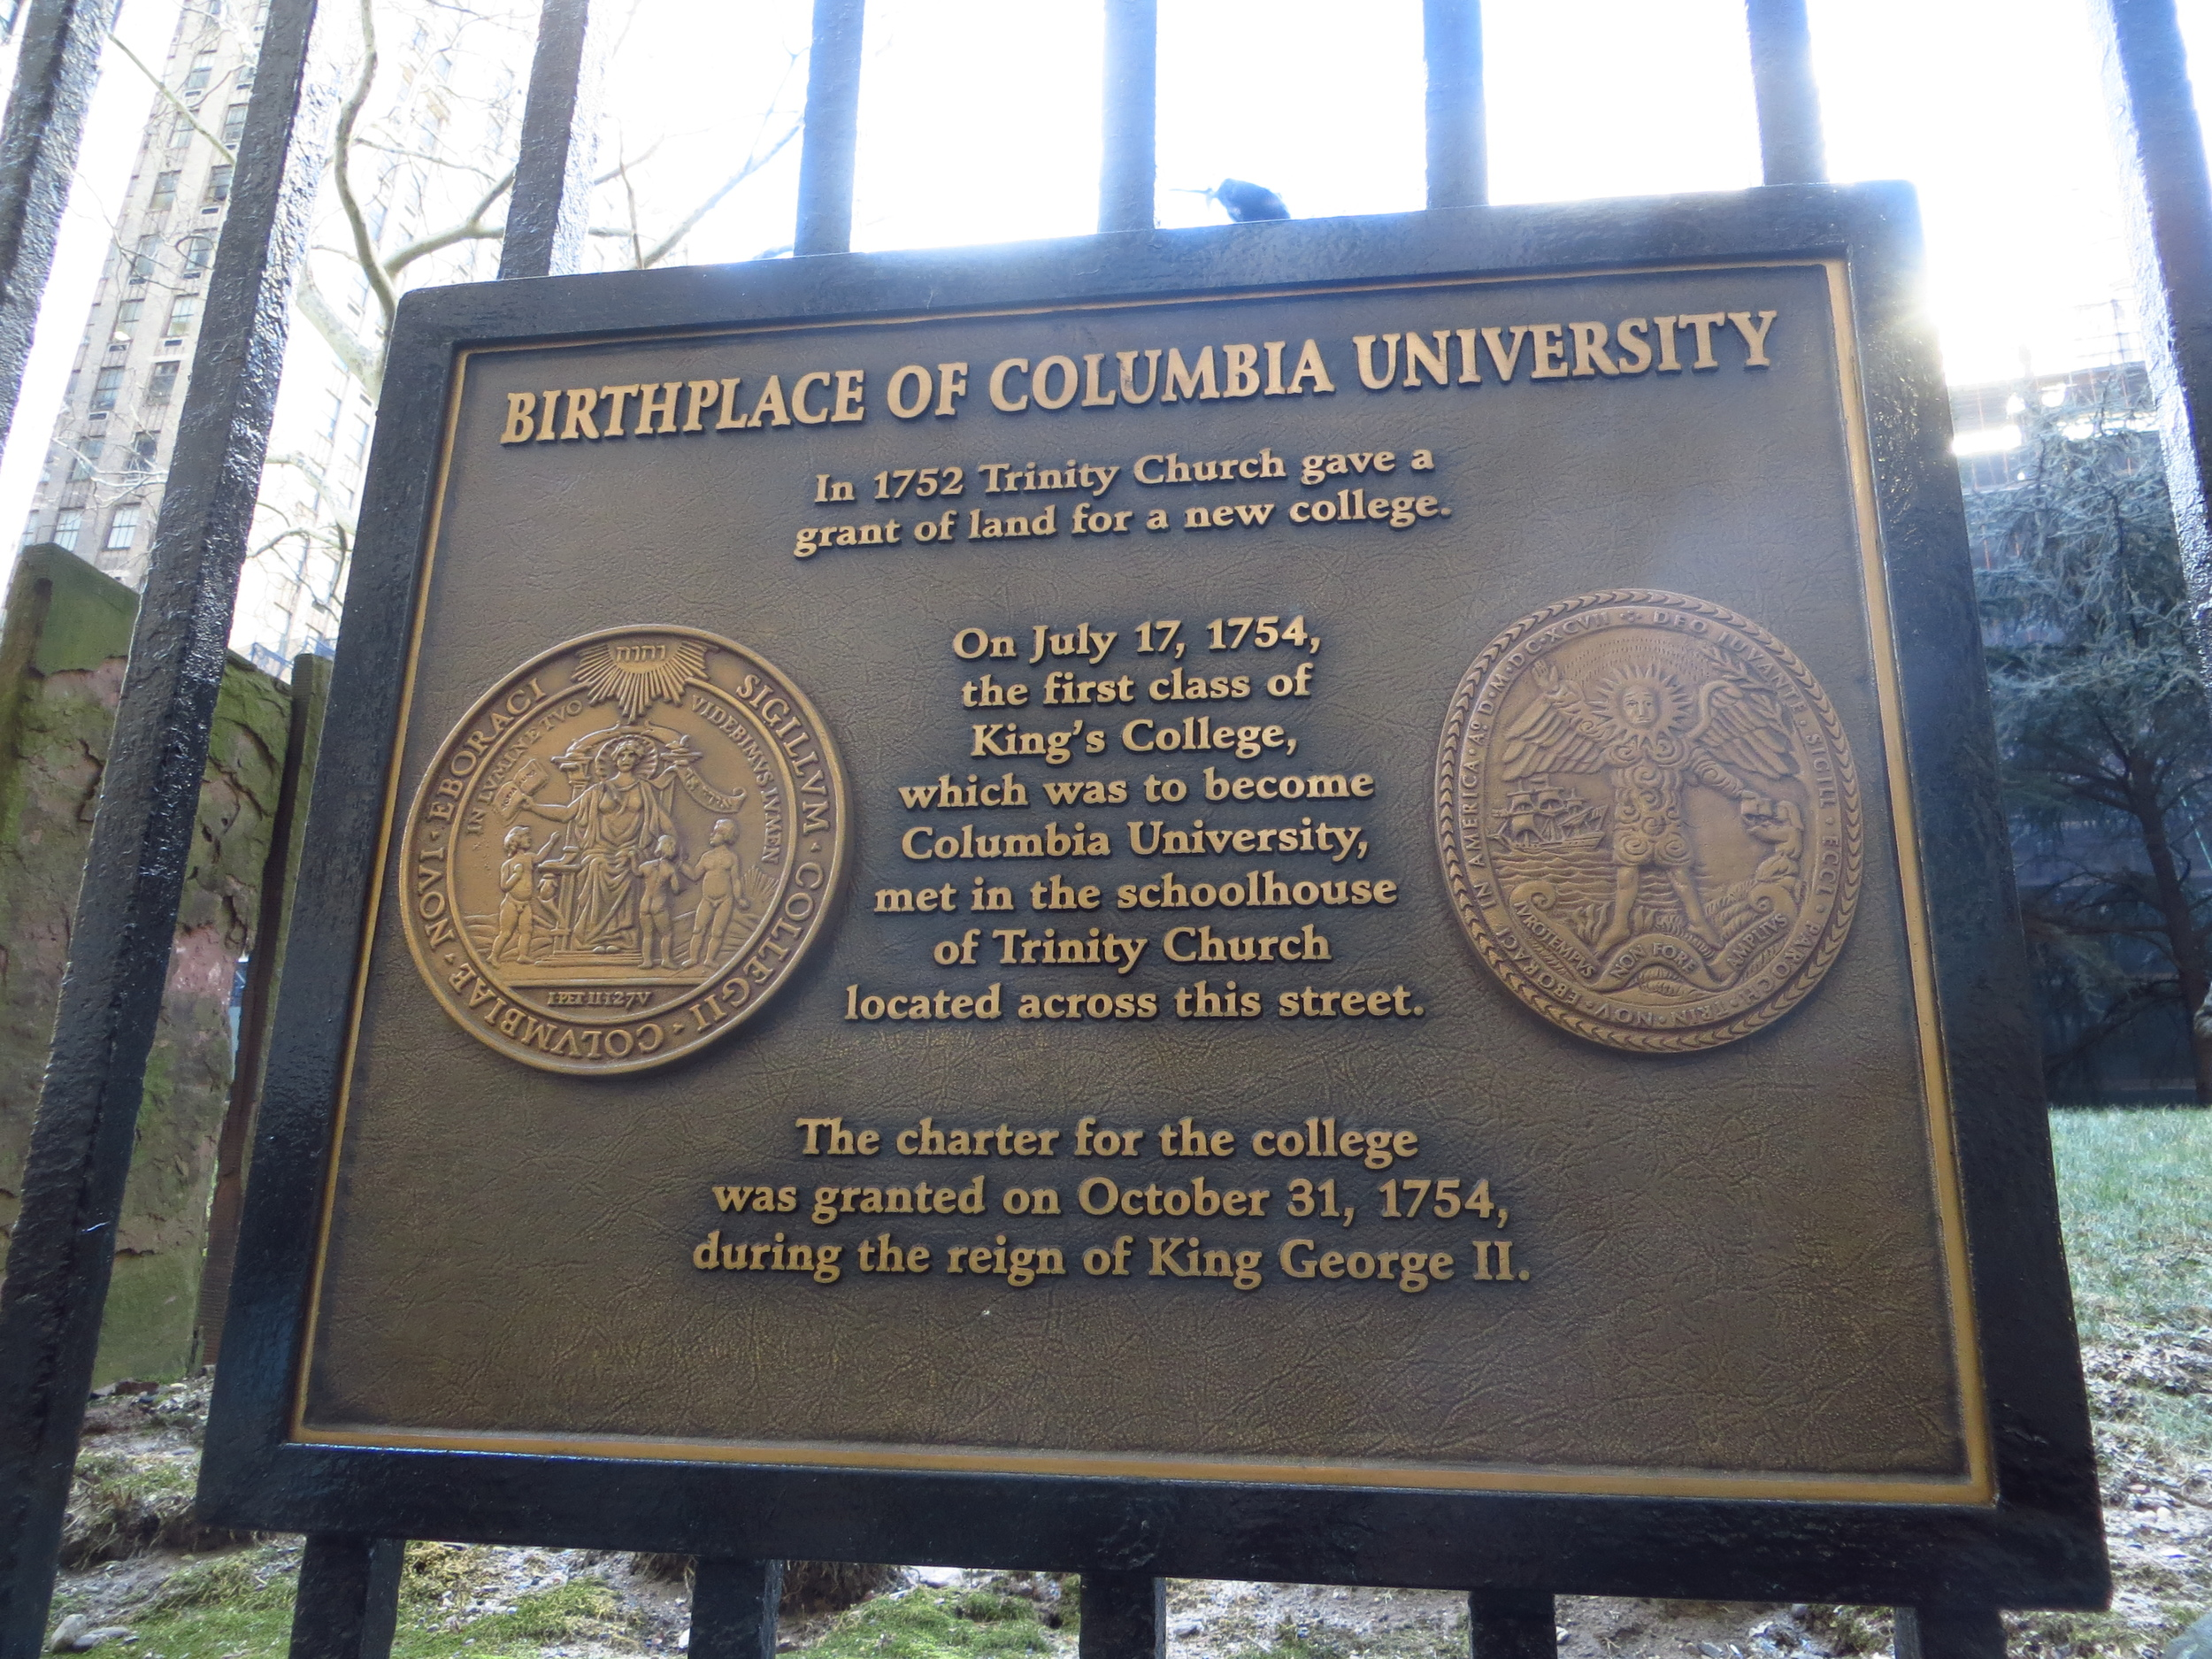 Birthplace of Columbia University